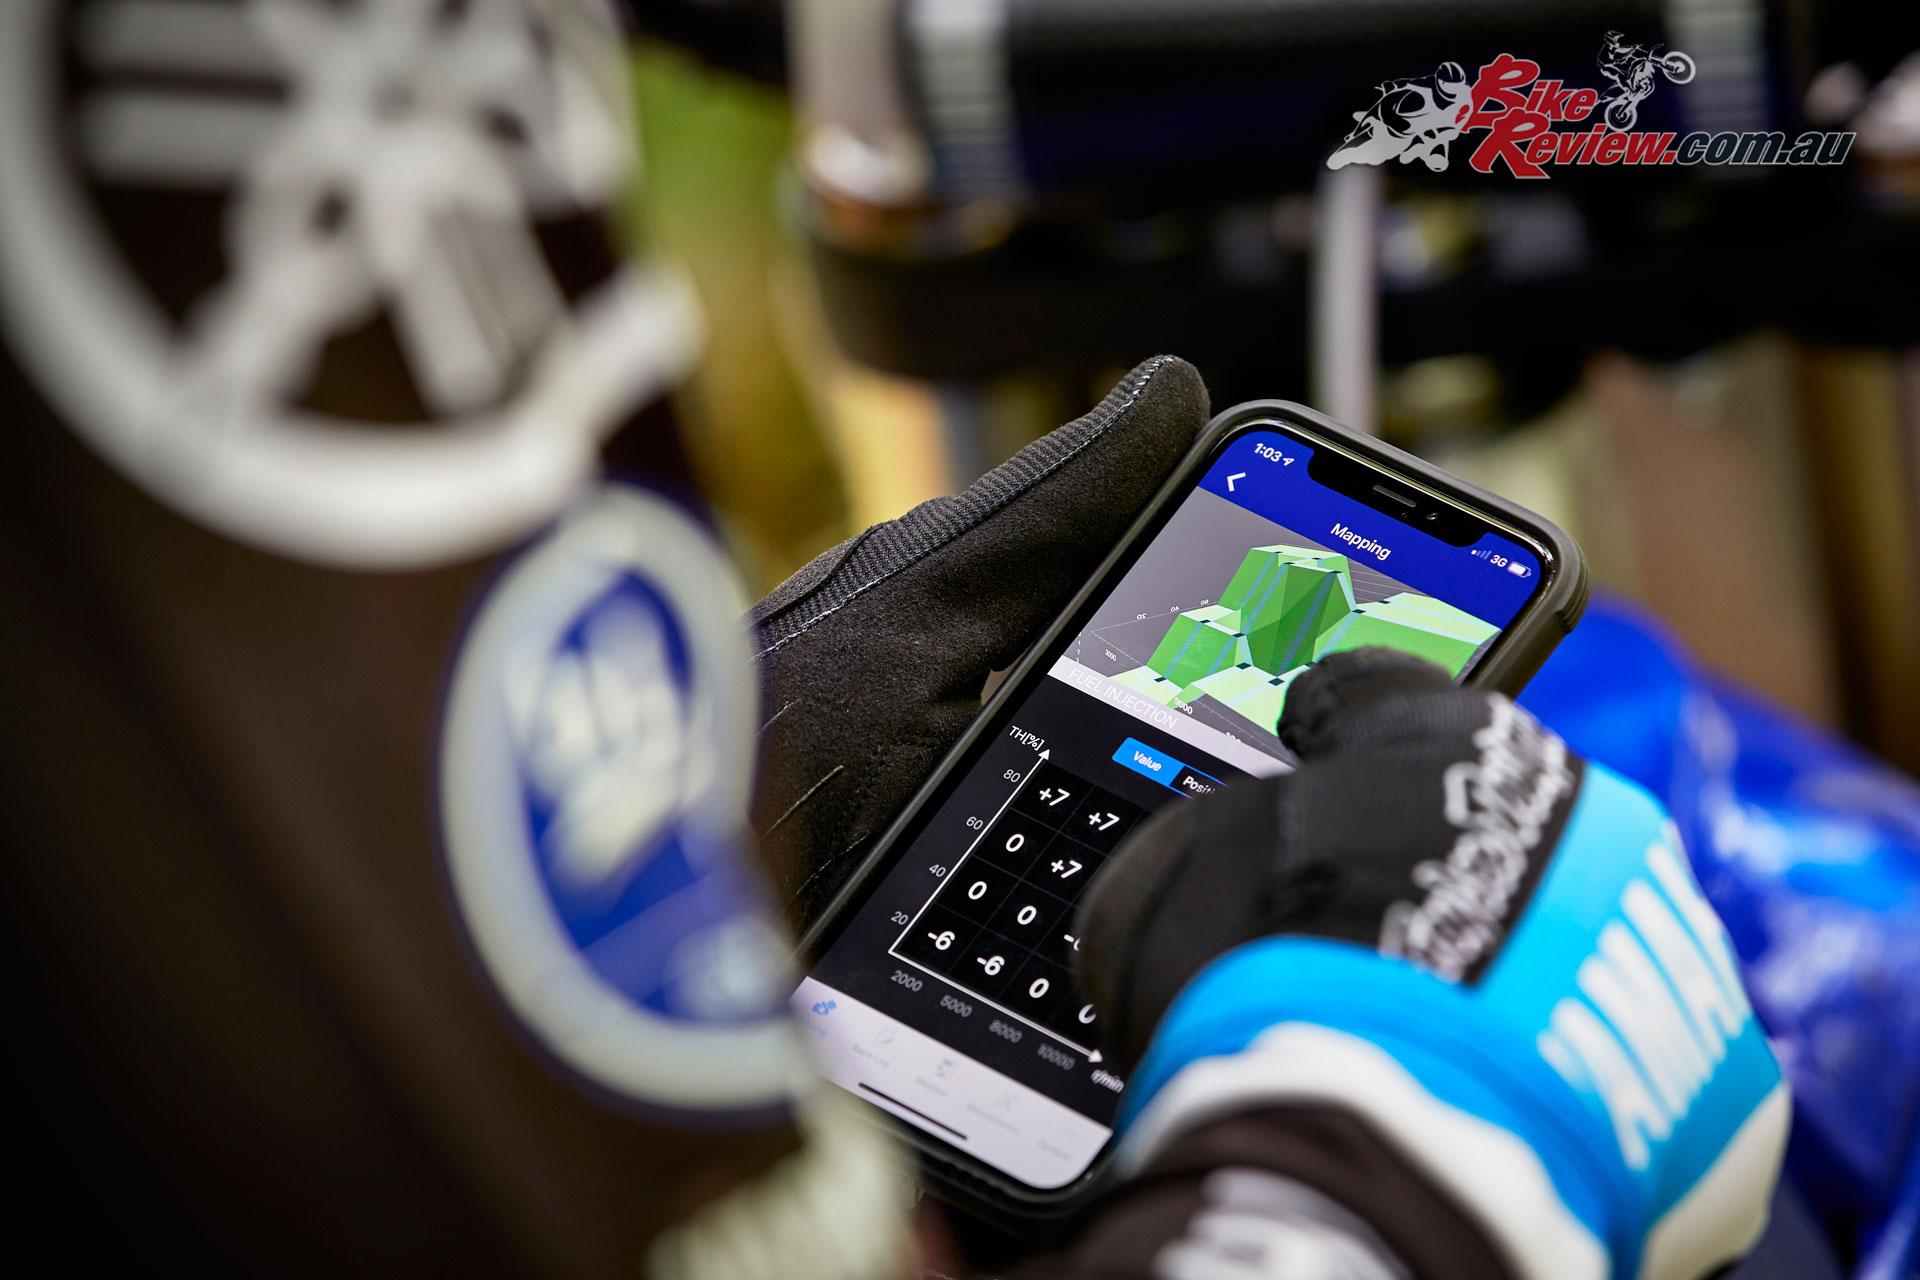 2020 Yamaha YZ250FX - Smartphone tuning capability